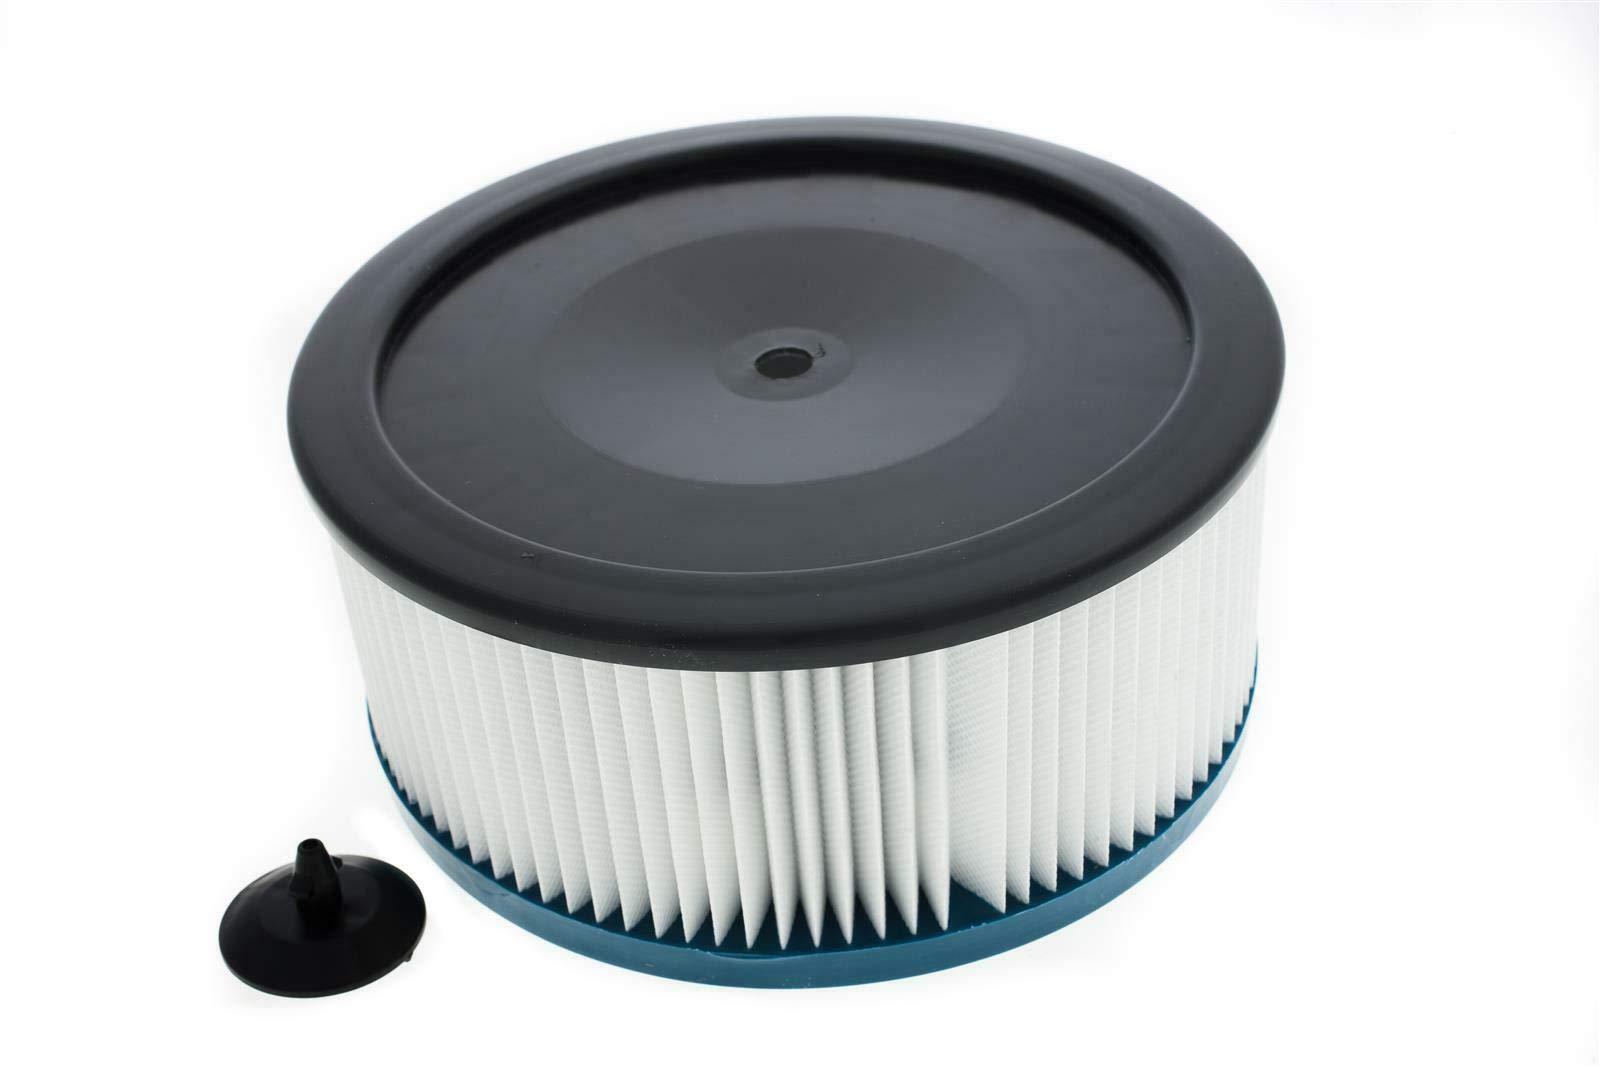 Filtro para aspiradora Starmix FPP 3600, 415109 Vacuum Dust Extractor: Amazon.es: Hogar